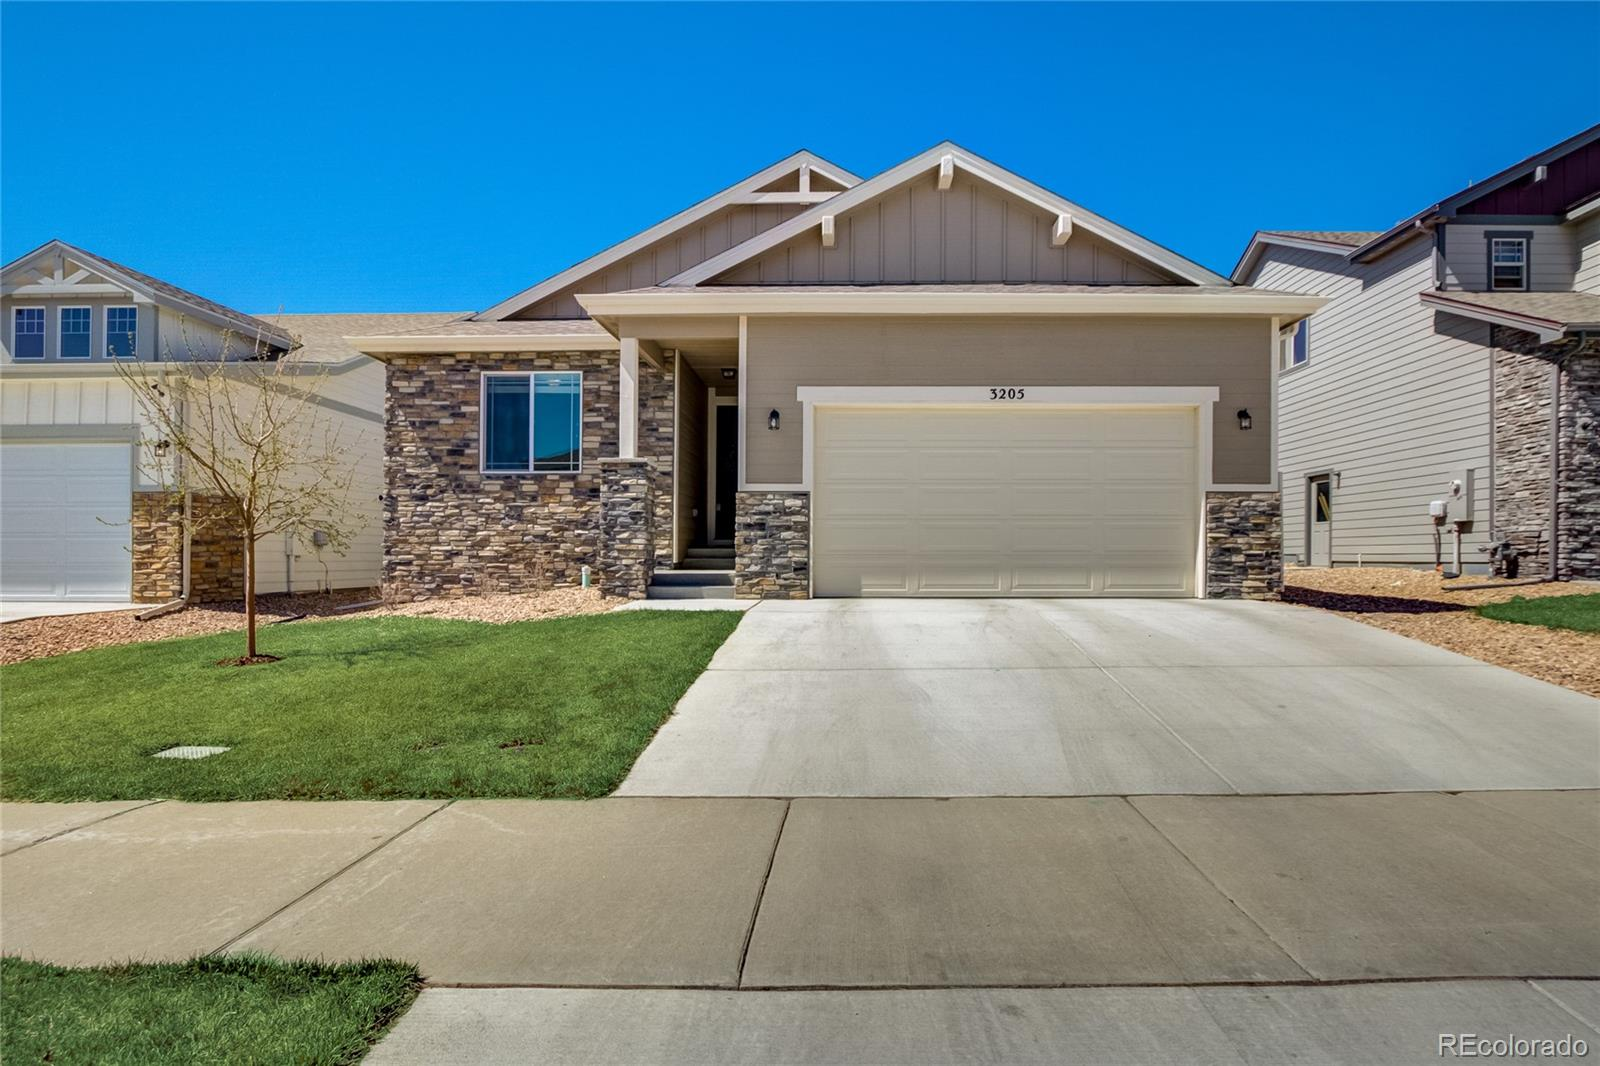 3205 San Carlo Avenue, Evans, CO 80620 - Evans, CO real estate listing